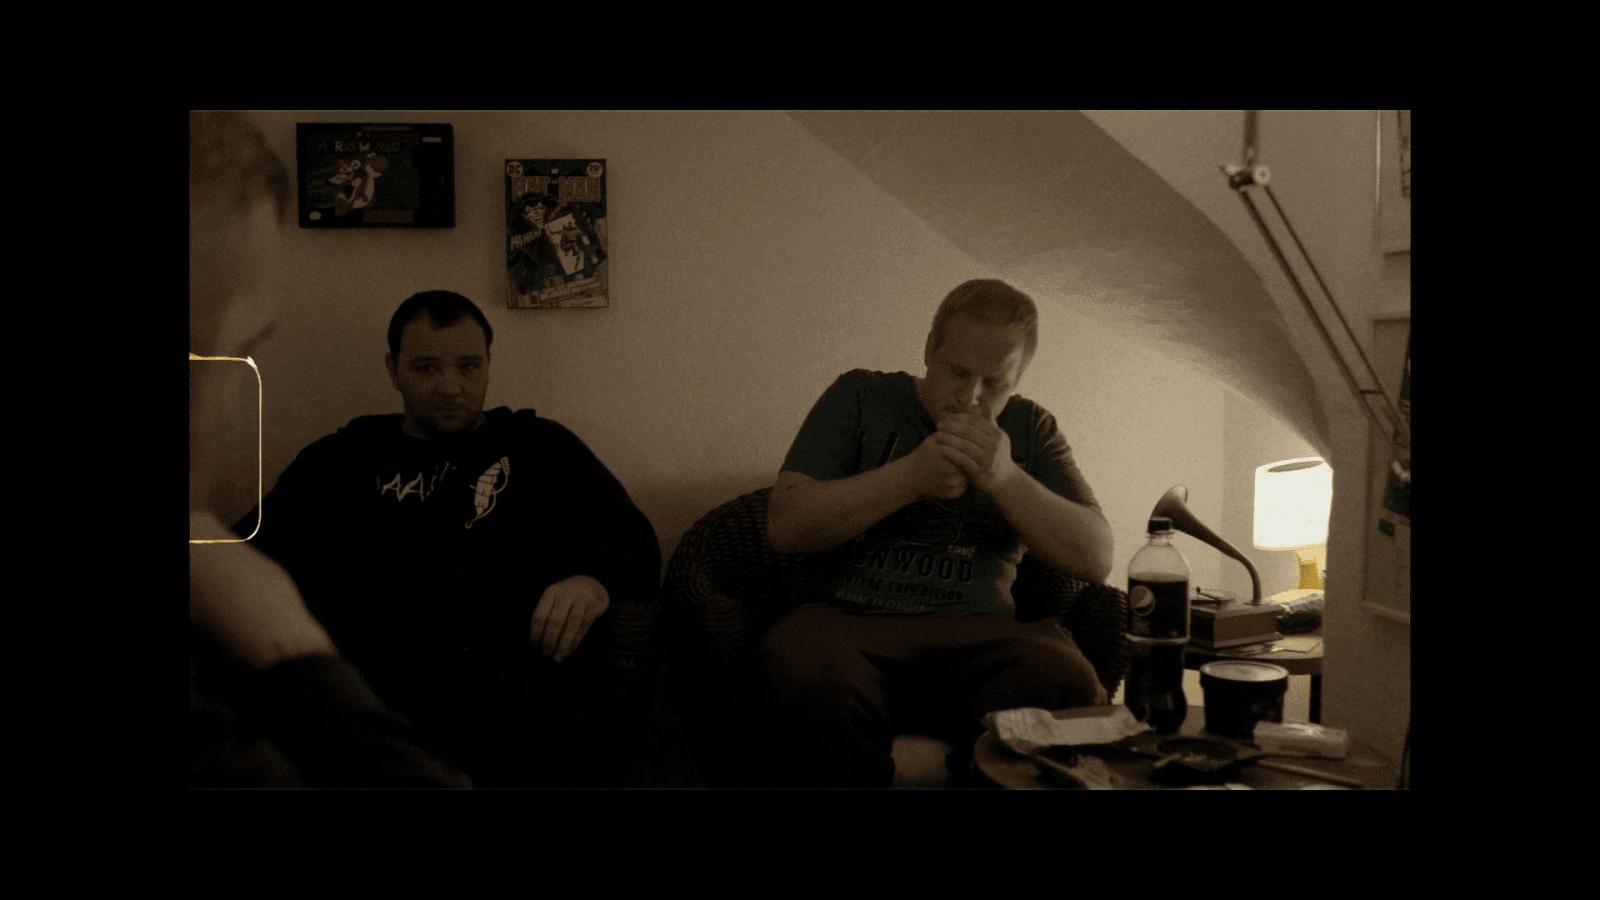 Upcoming: Knackpunkt, Lakmann - Herzschlag